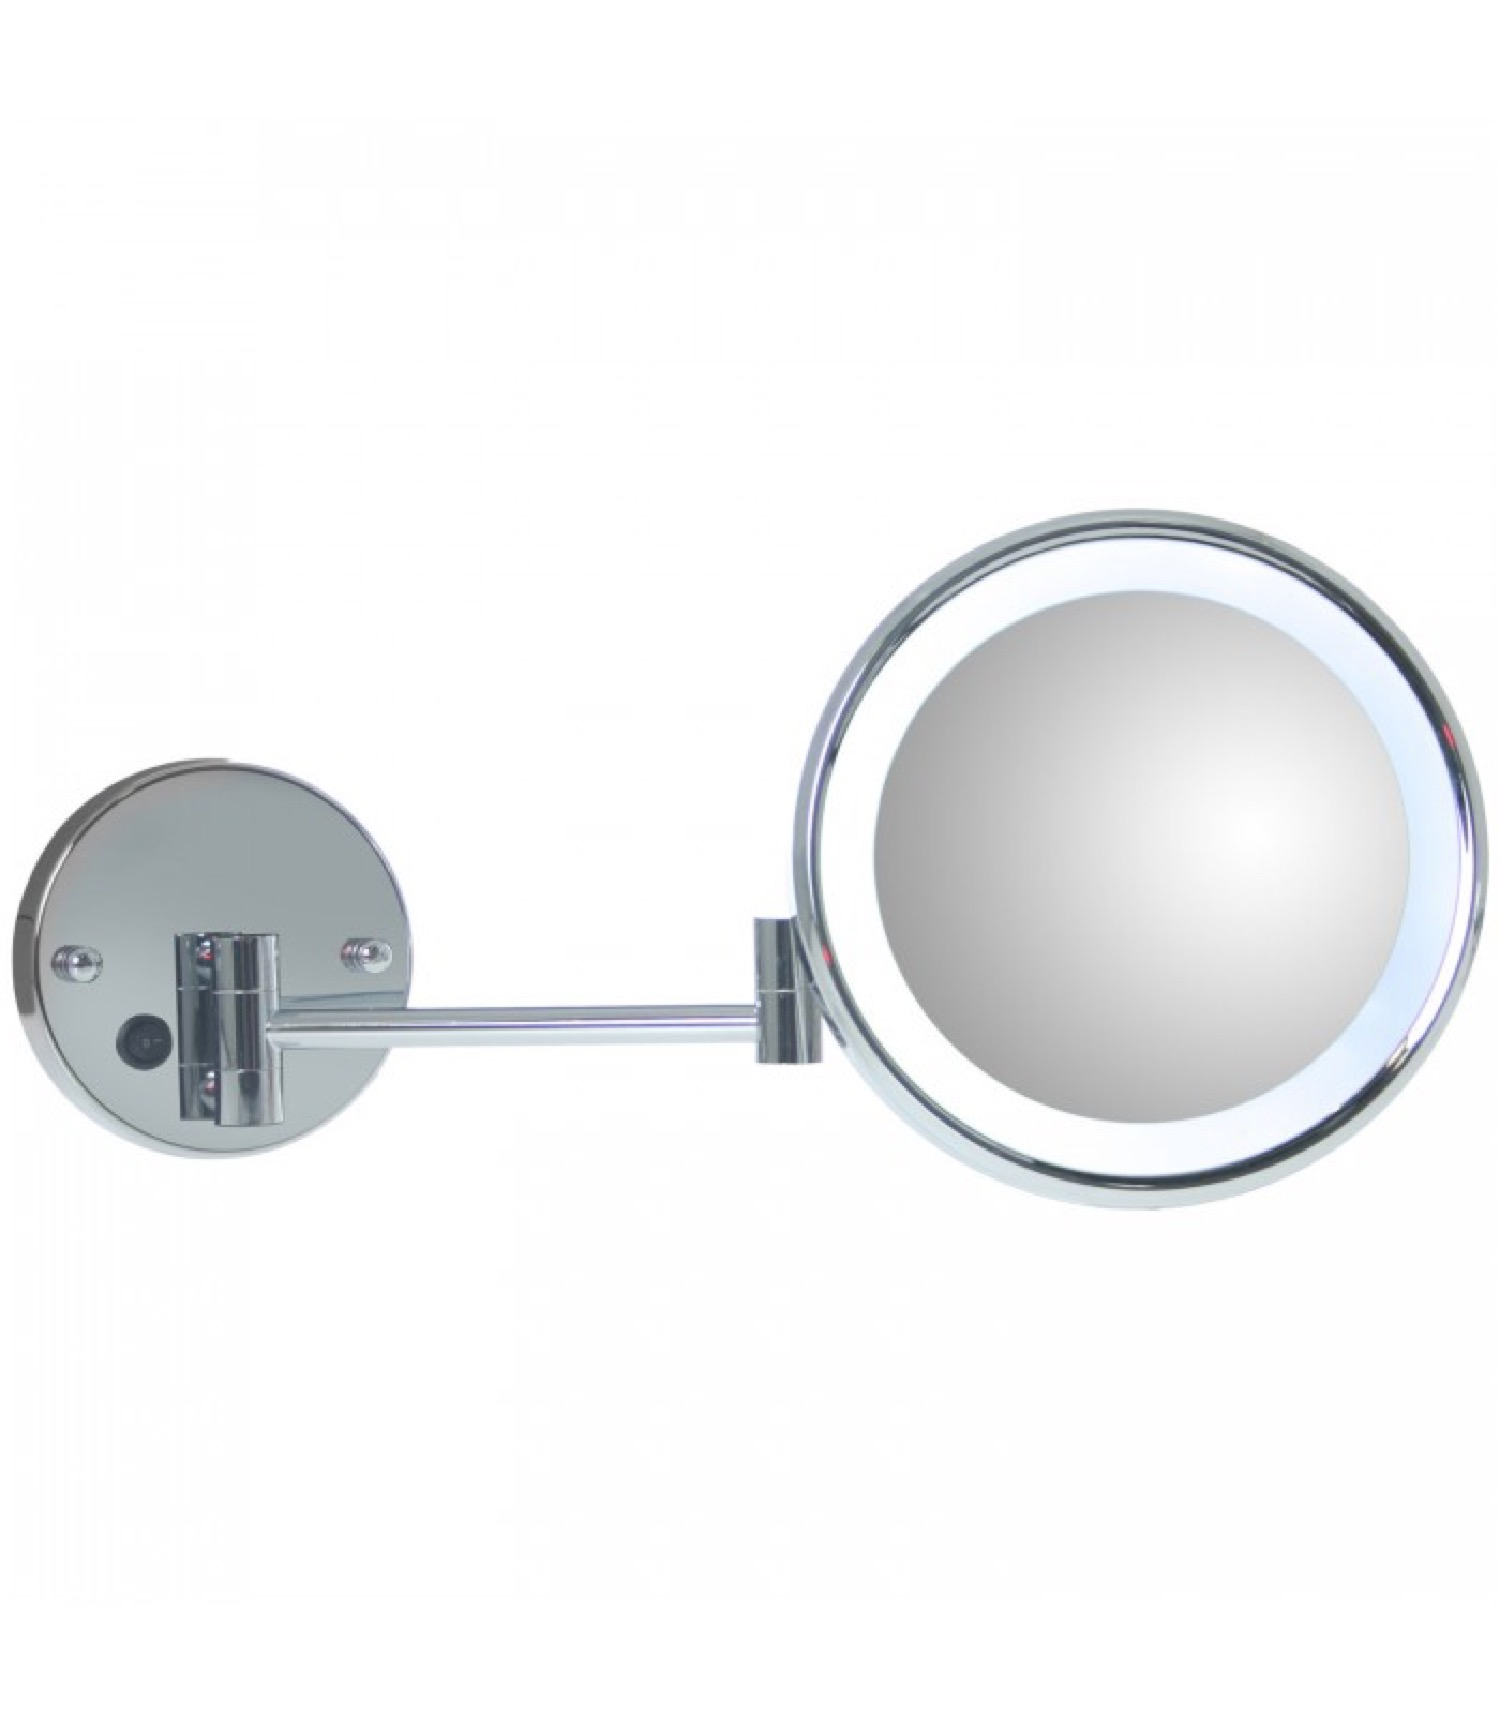 Miroir grossissant (x5) mural lumineux rond sur bras extensible